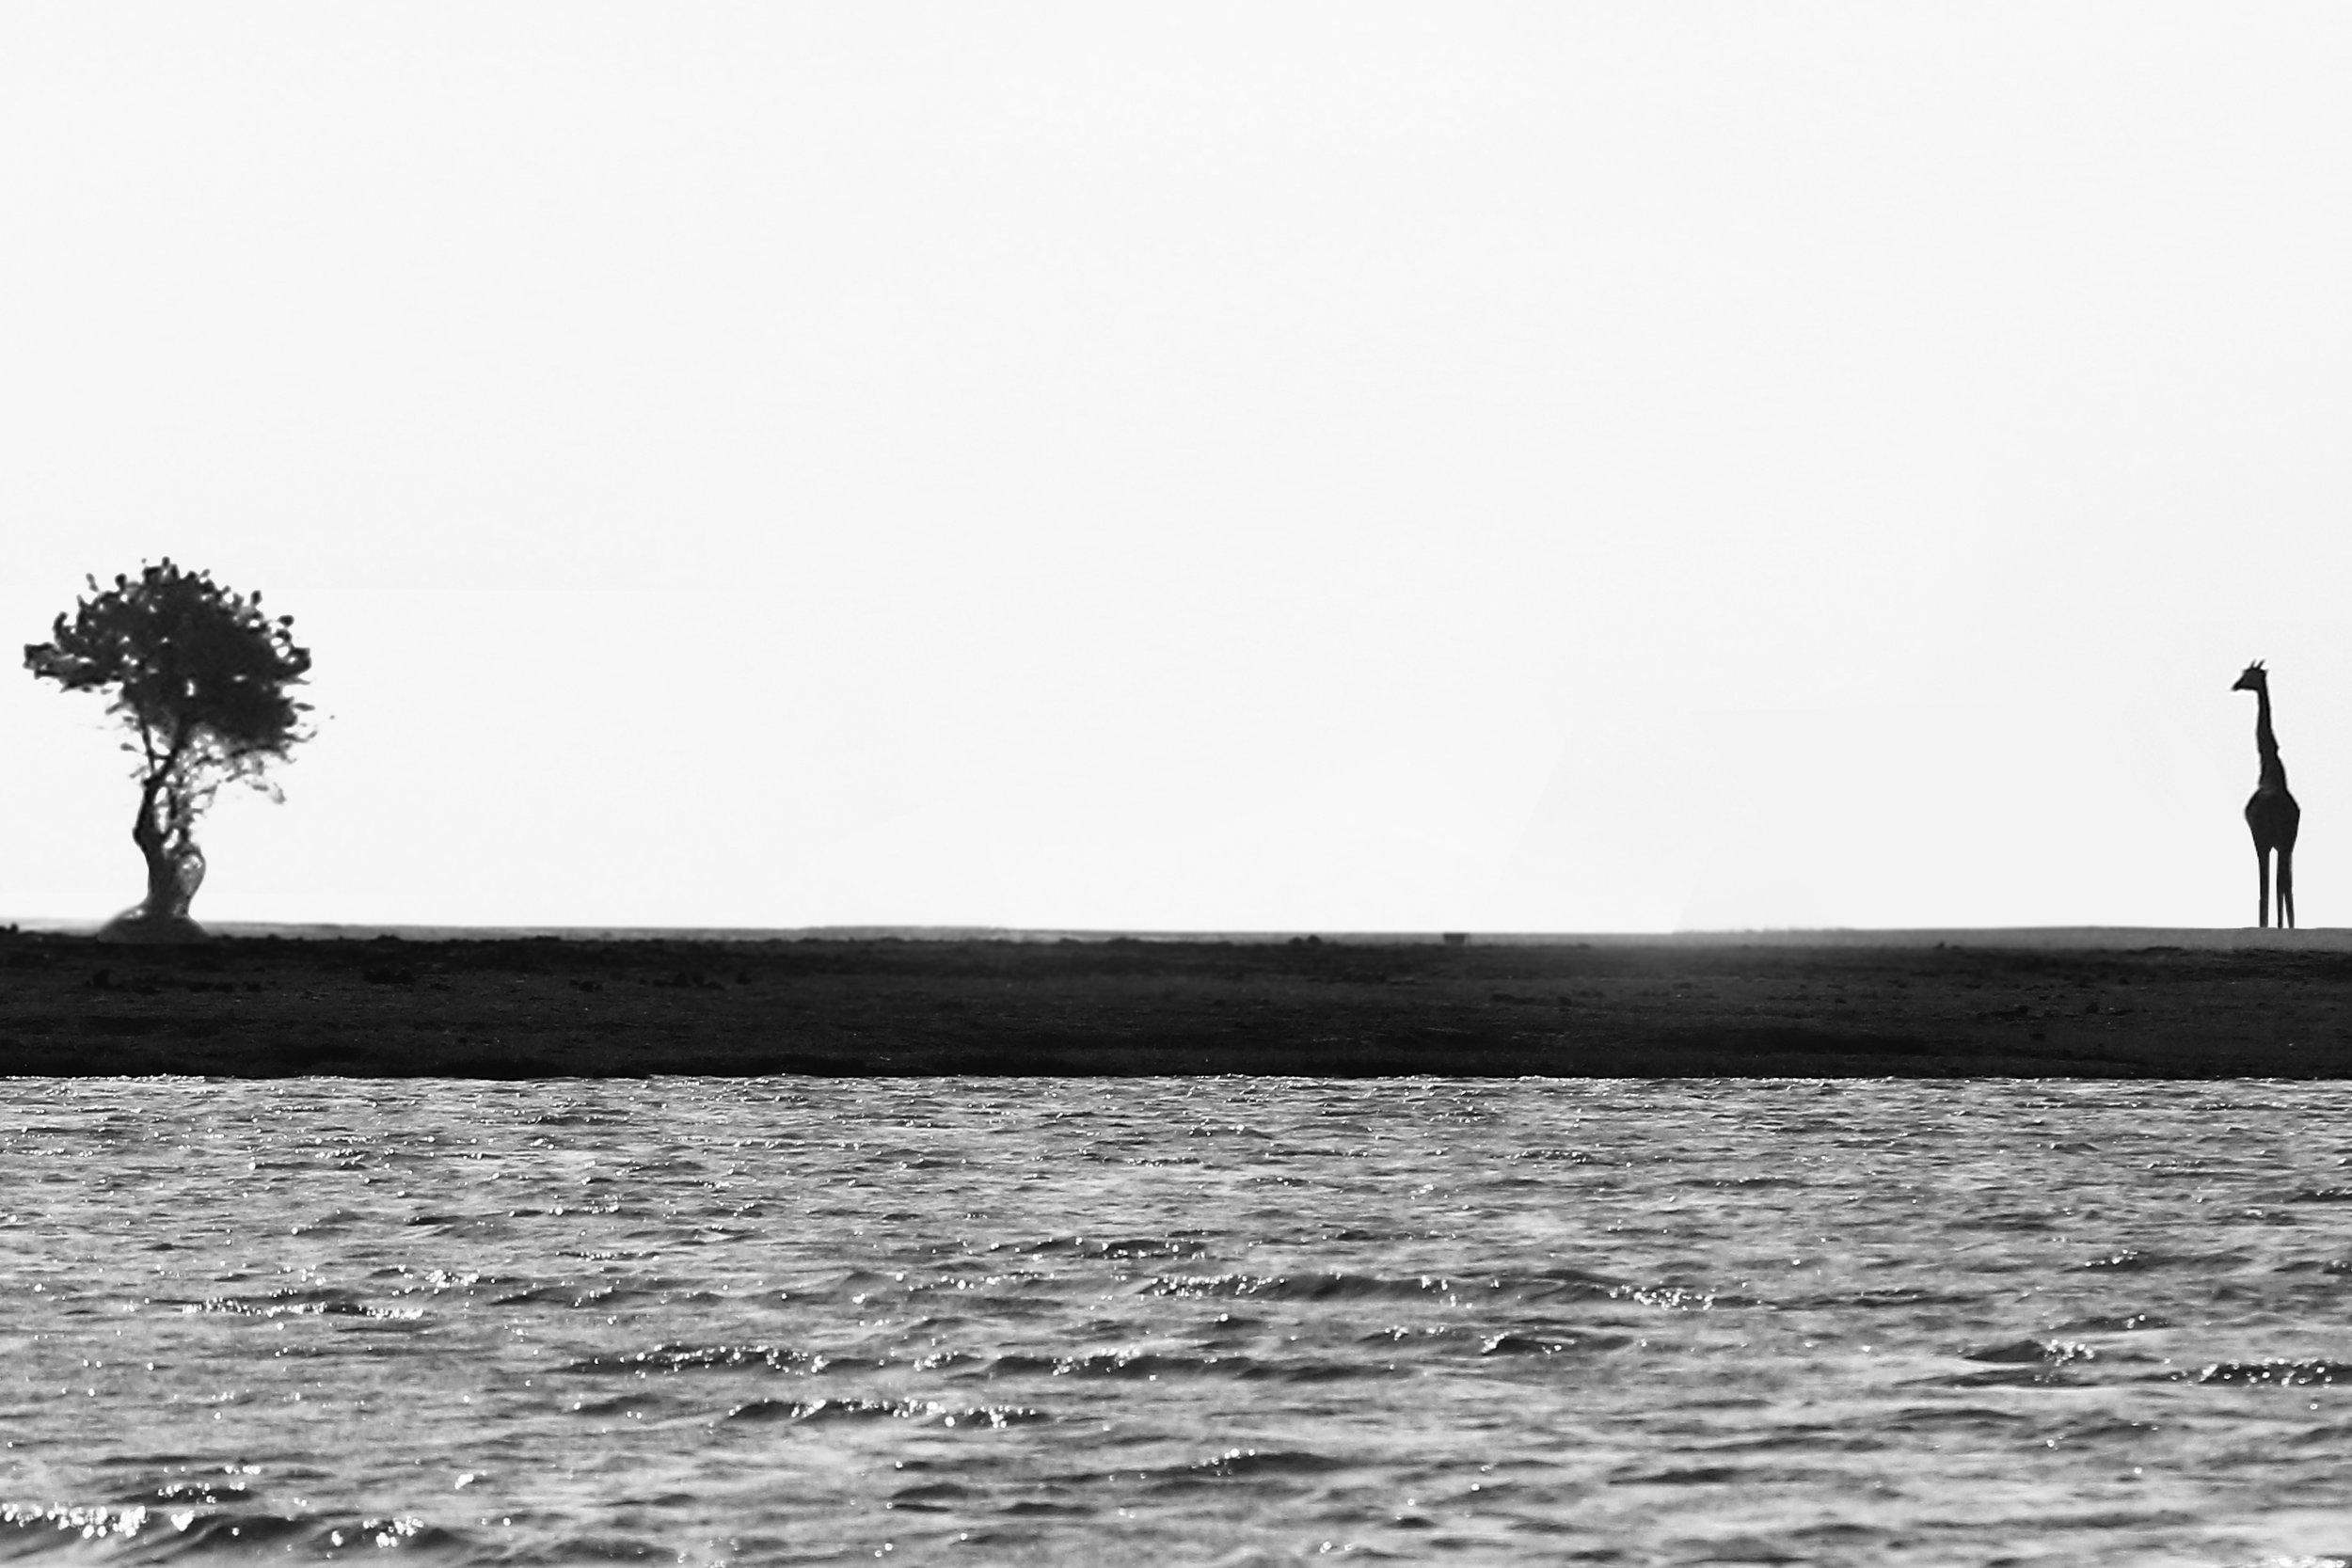 Photographed by  Jason Naudé